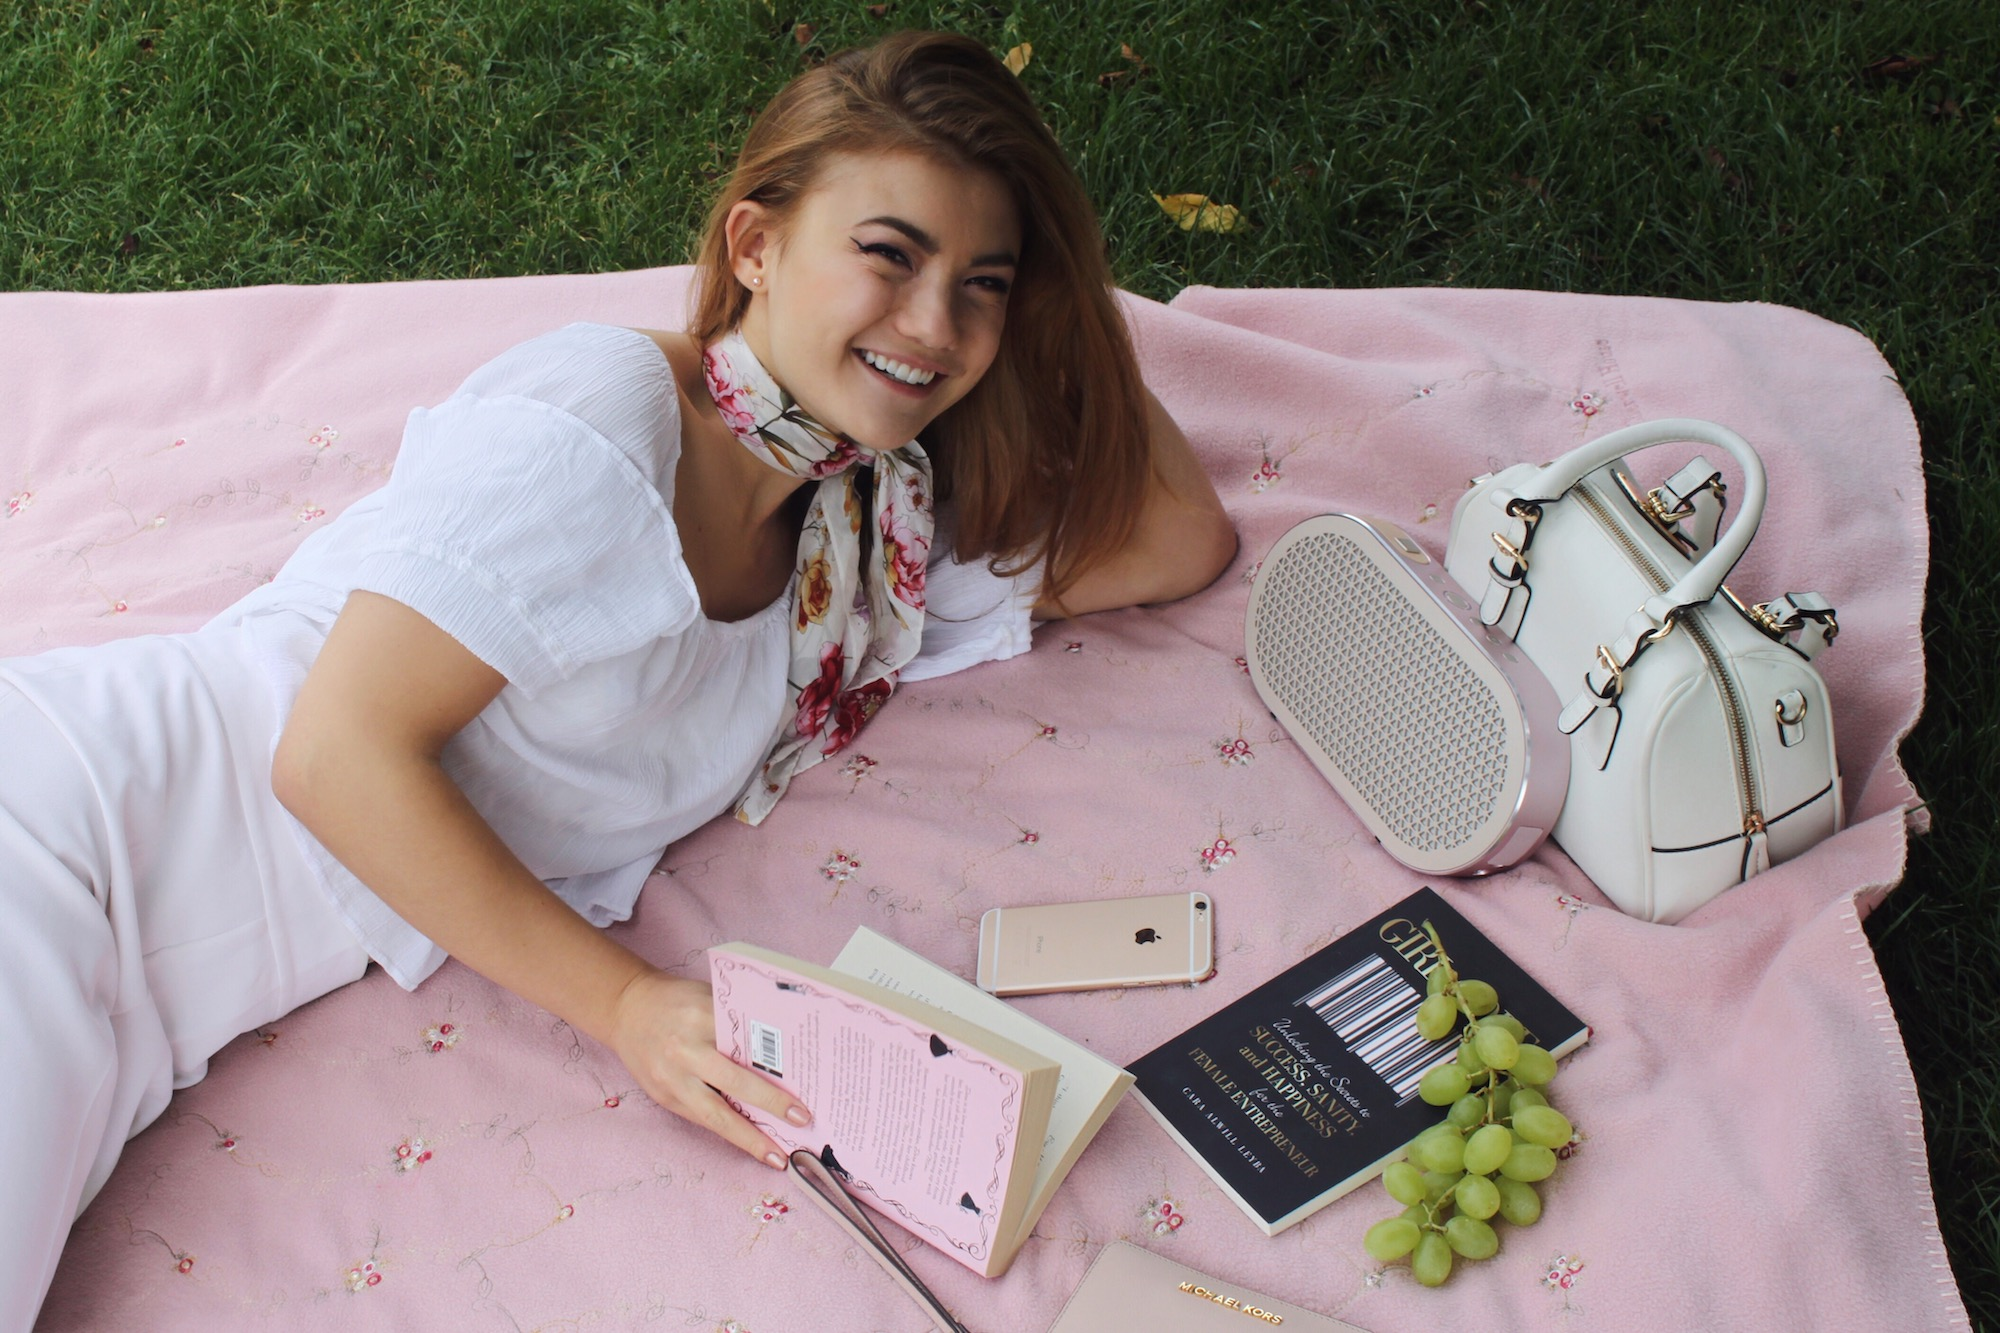 juliana-chow-dali-speakers-play-katch-campaign-instagram-social-technology-fashion-copenhagen-london-blog-blogger8